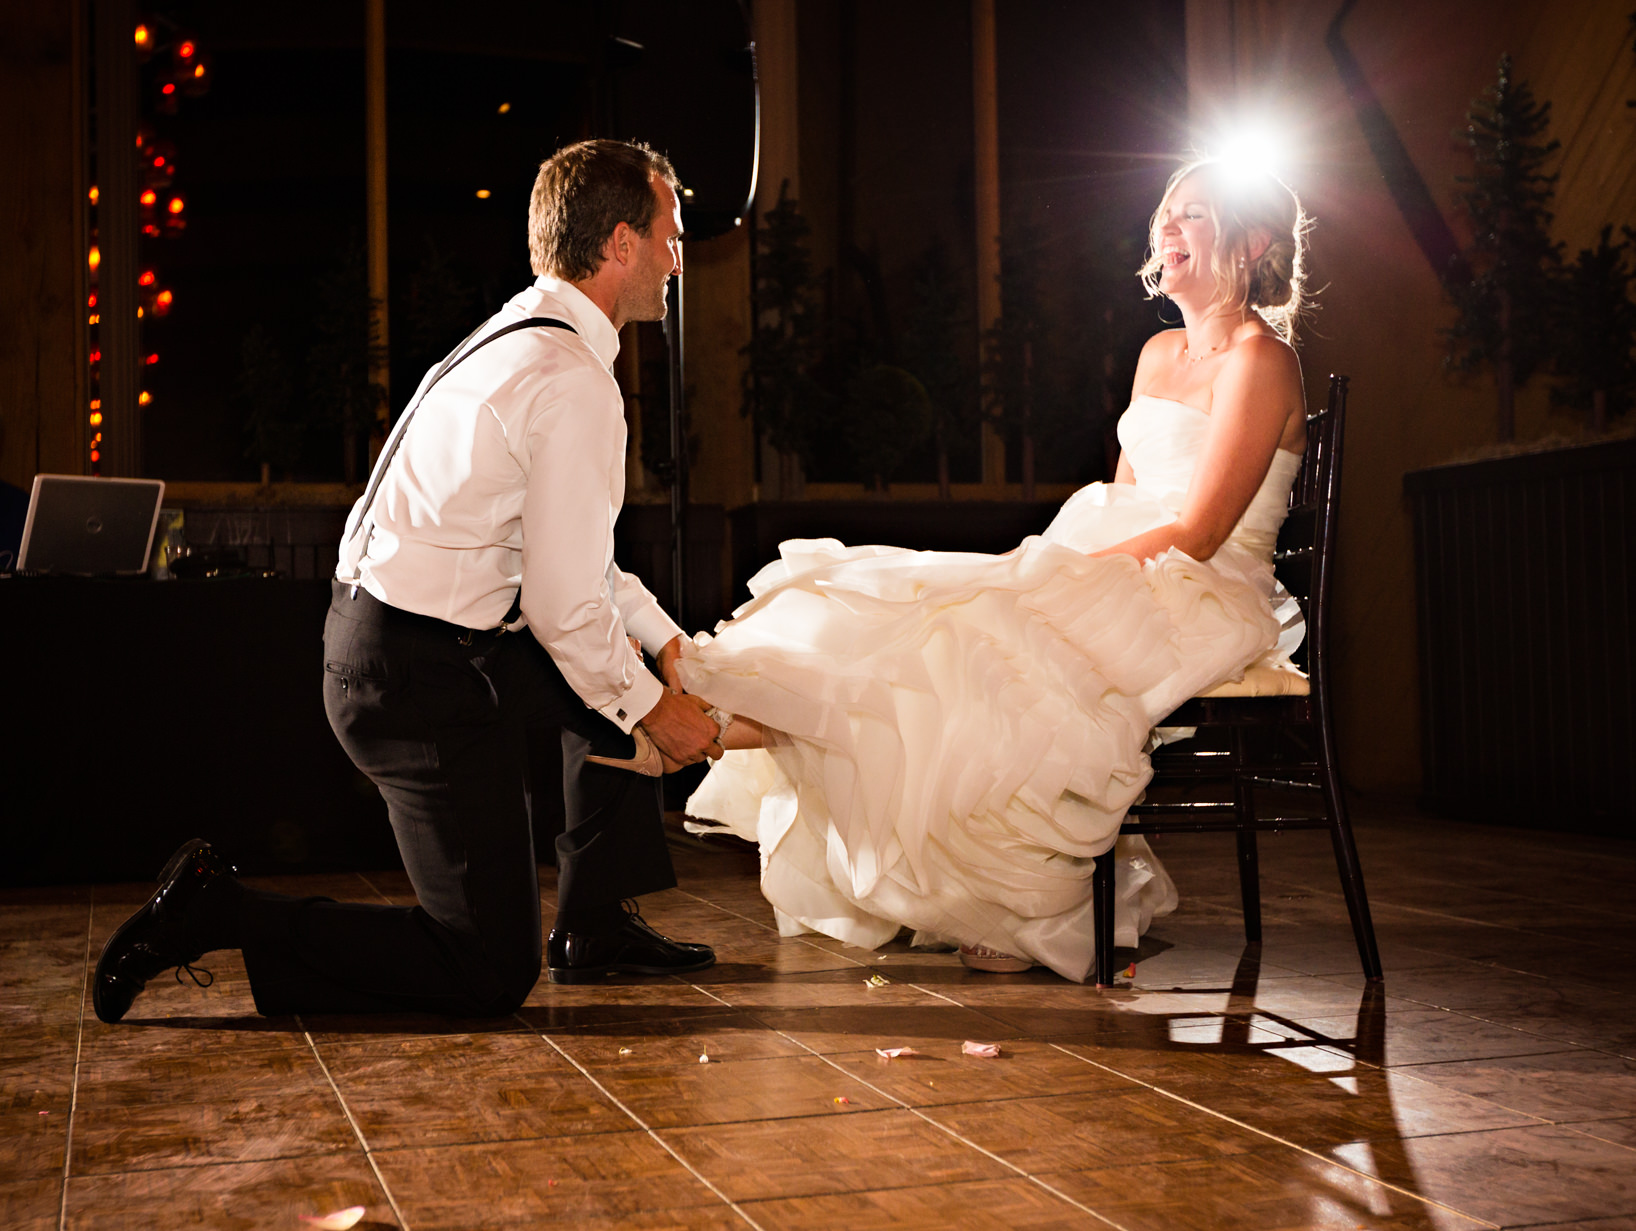 big-sky-resort-wedding-groom-removes-garter.jpg